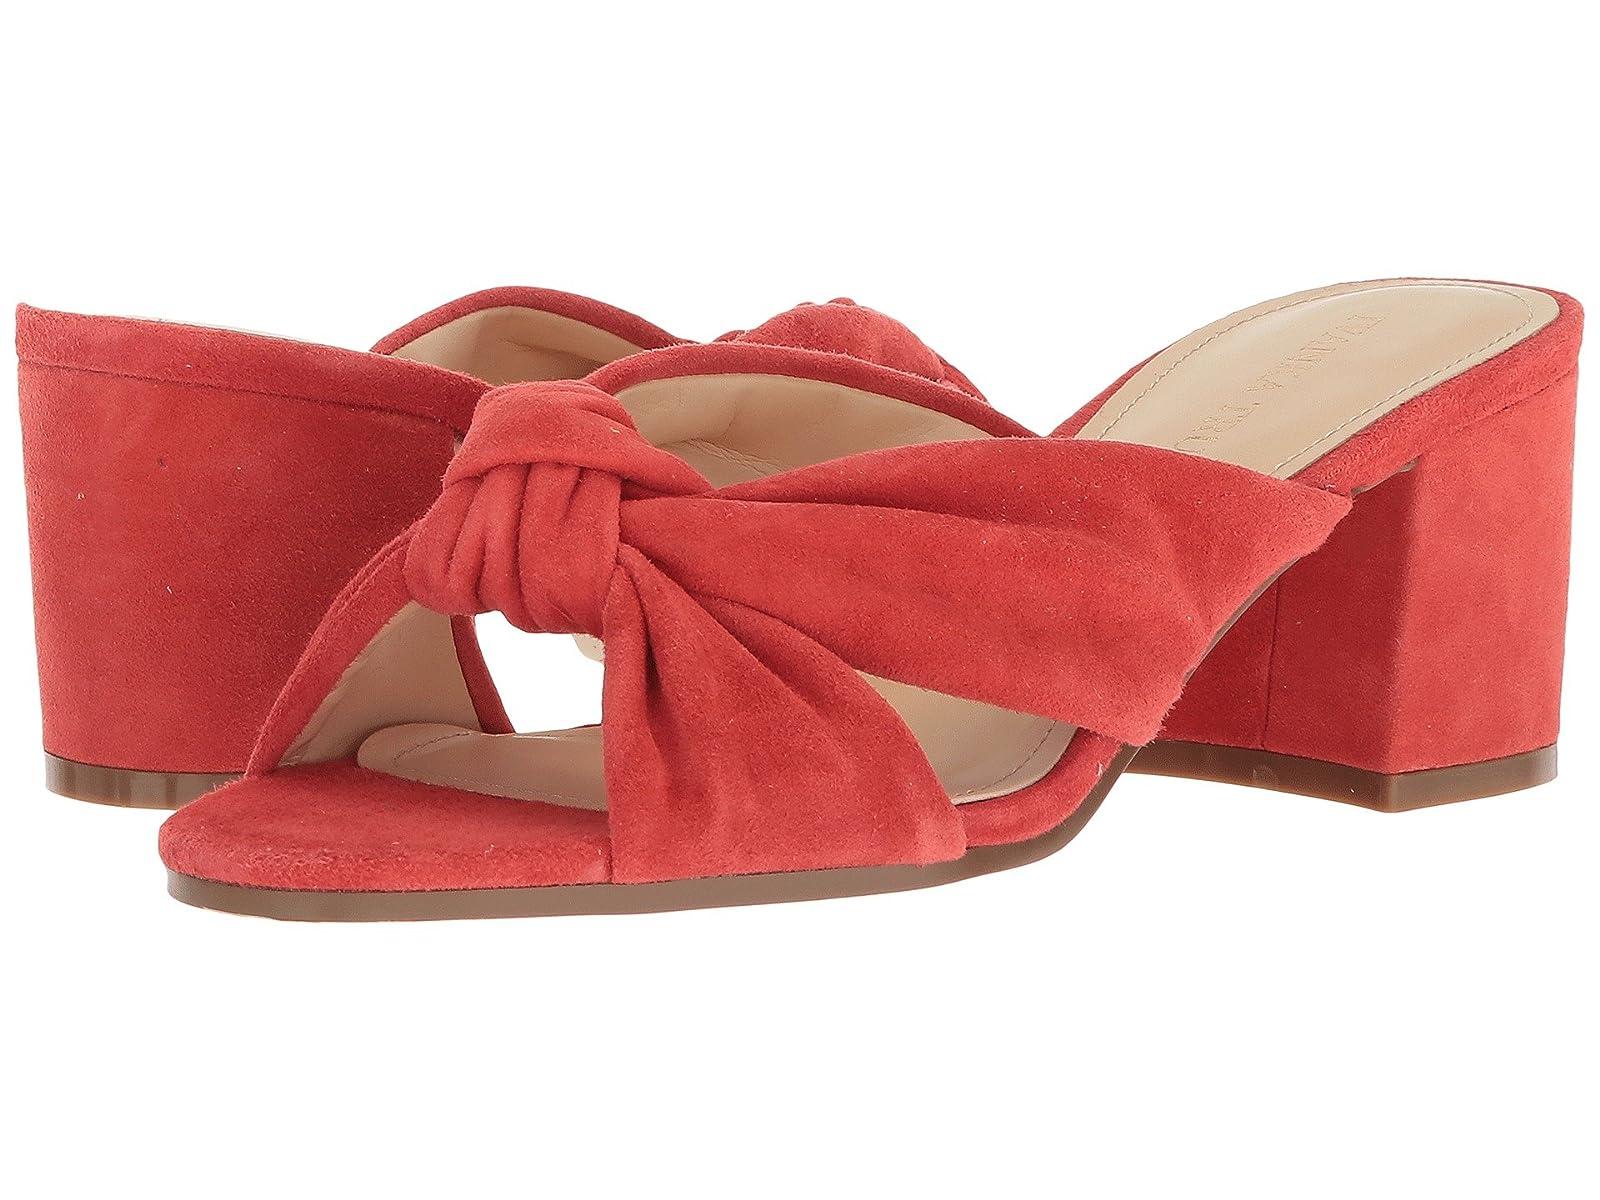 Ivanka Trump EarinCheap and distinctive eye-catching shoes